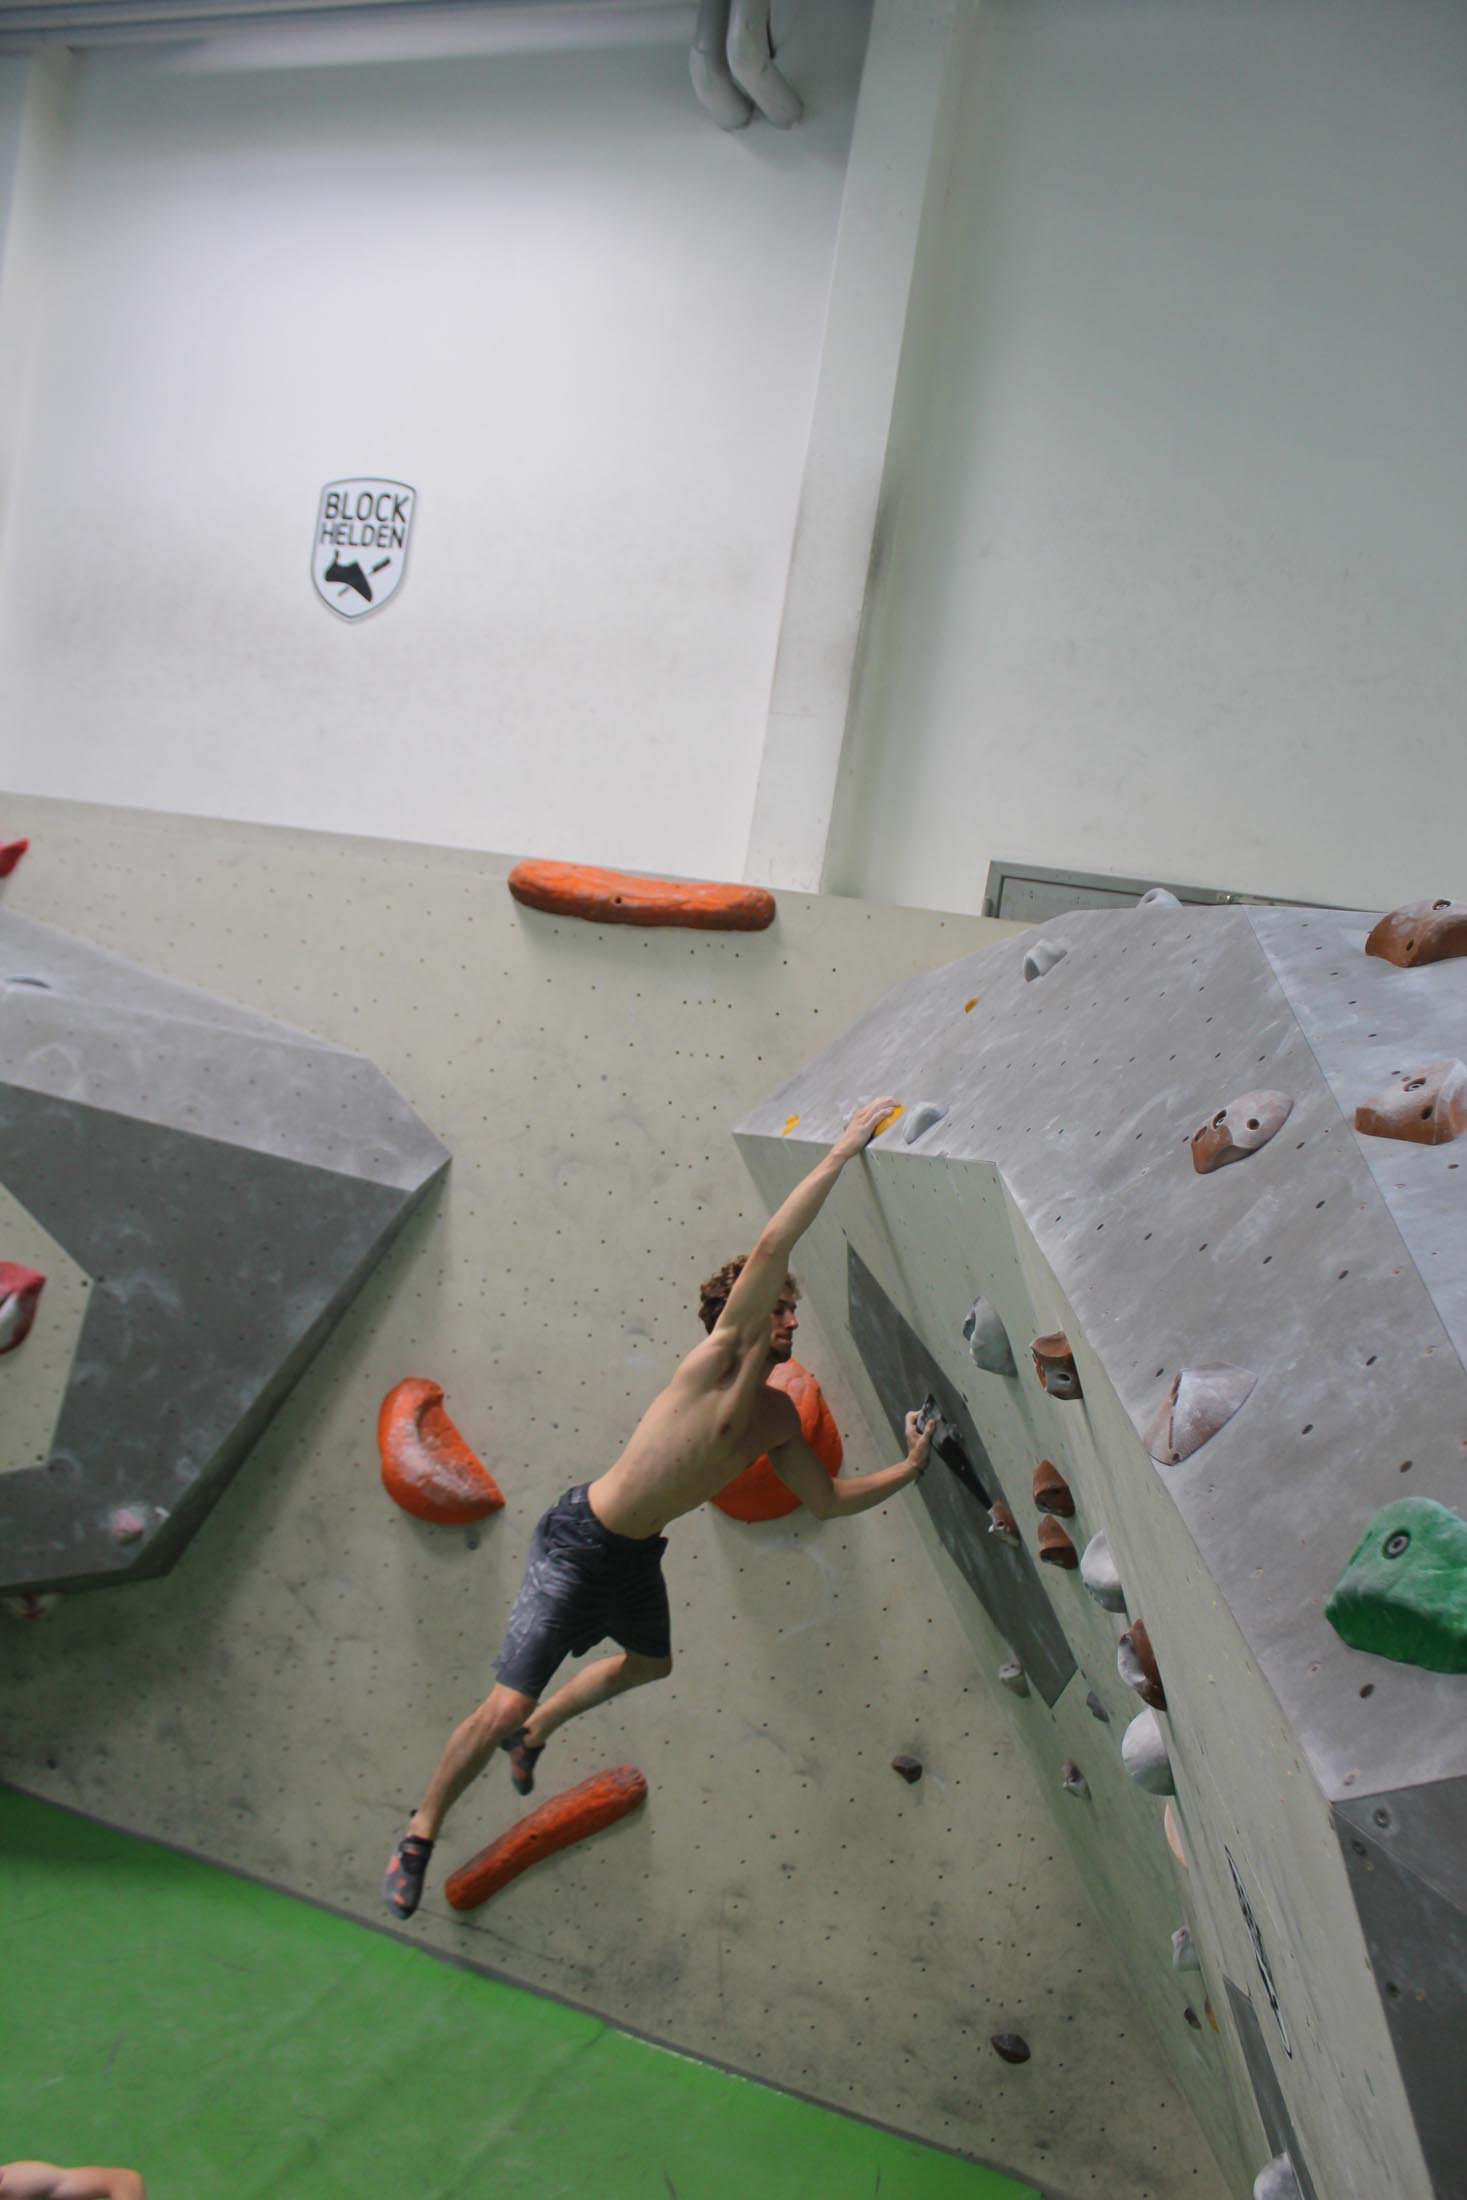 Quali, internationaler bouldercup Frankenjura 2016, BLOCKHELDEN Erlangen, Mammut, Bergfreunde.de, Boulderwettkampf07092016219